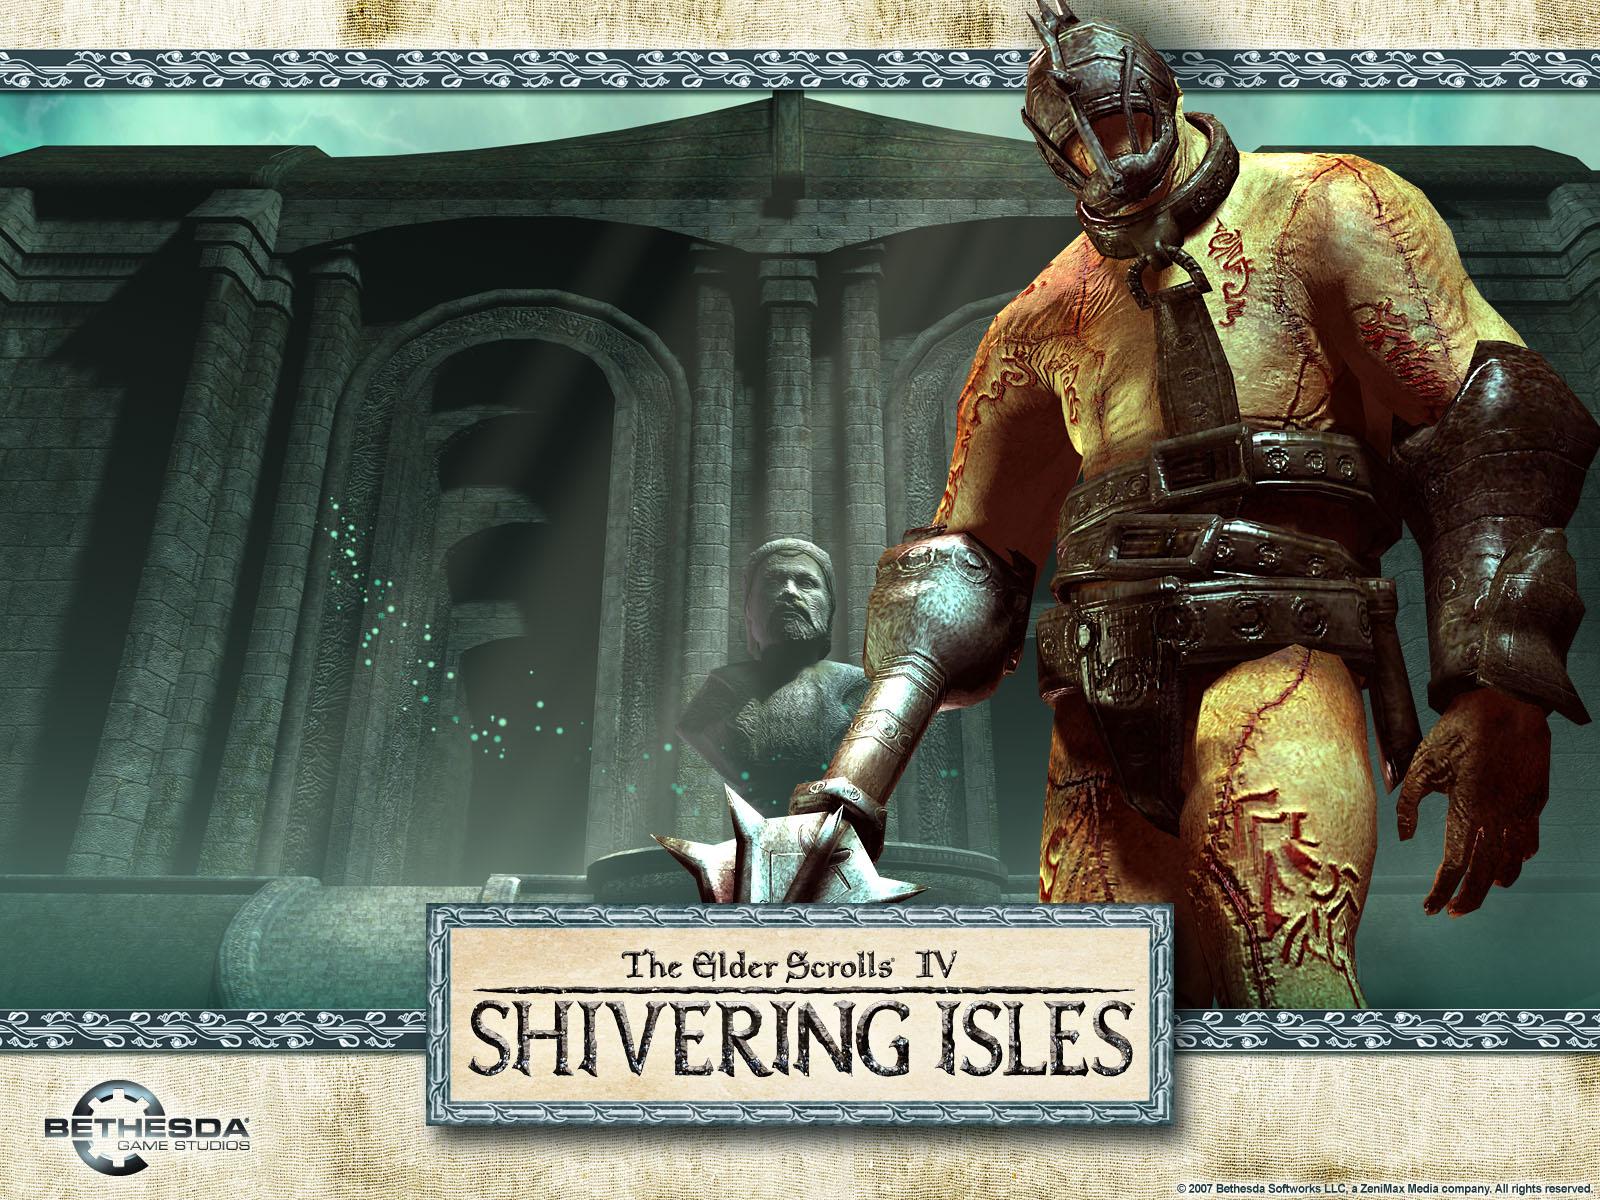 Shivering Isles Wallpaper - The Gatekeeper